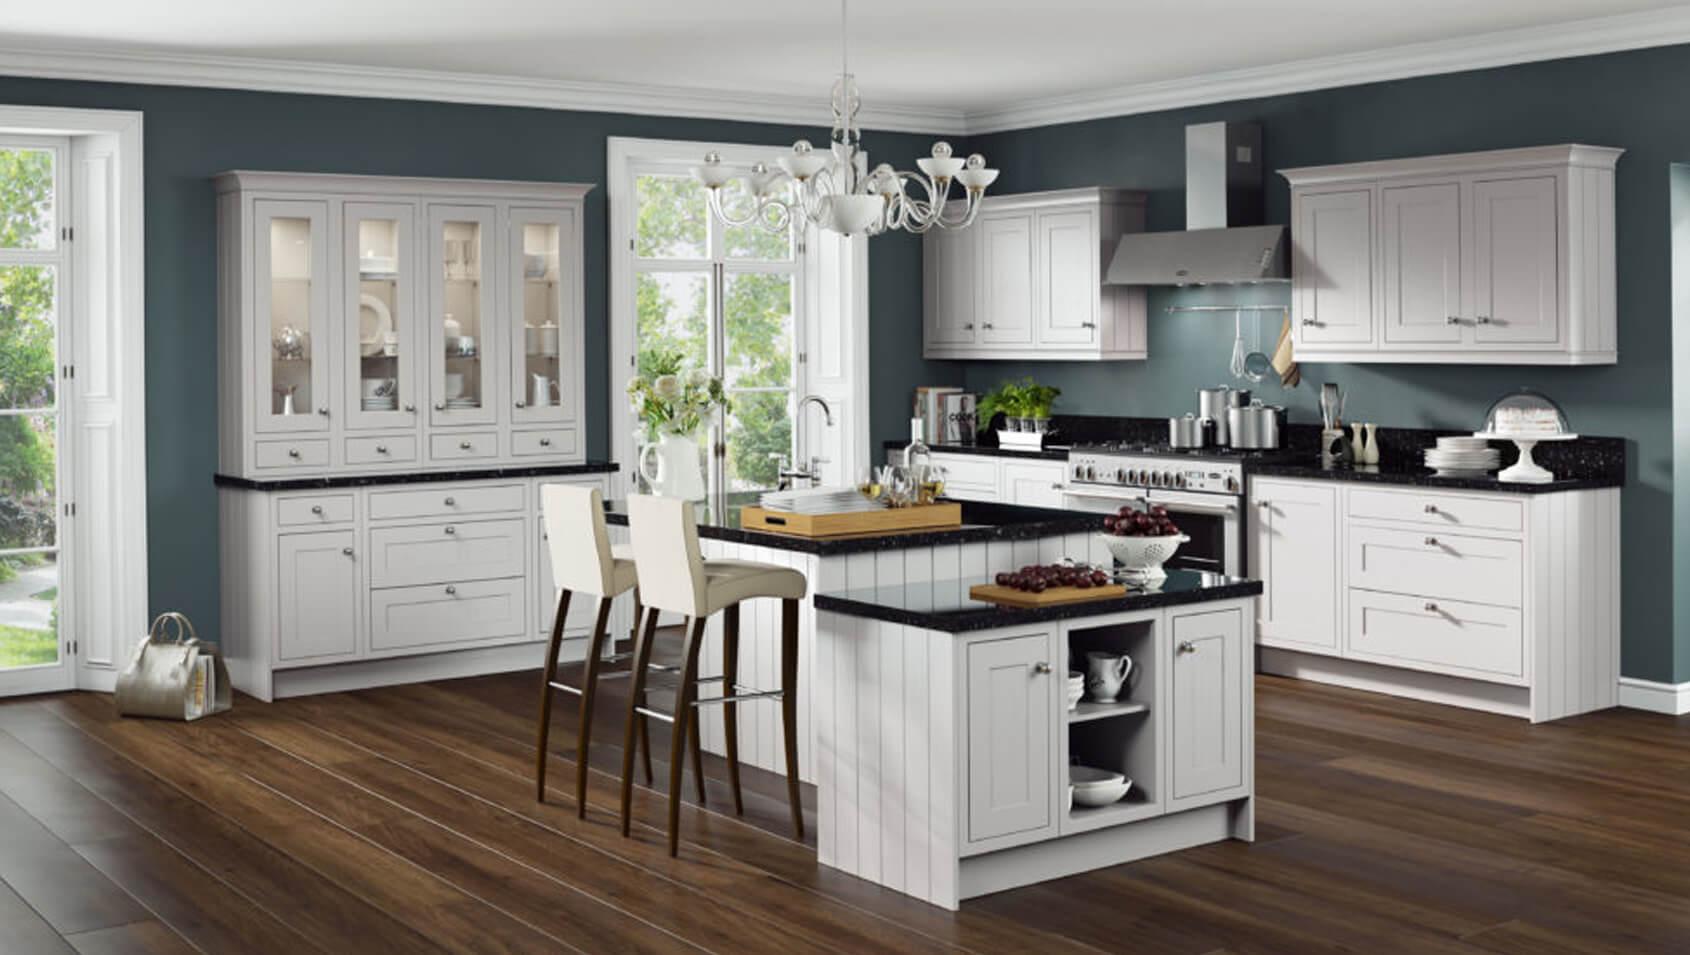 Finlay Kitchens, Wardrobes U0026 Interior Specialists, Galway.    Www.finlaykitchens.com